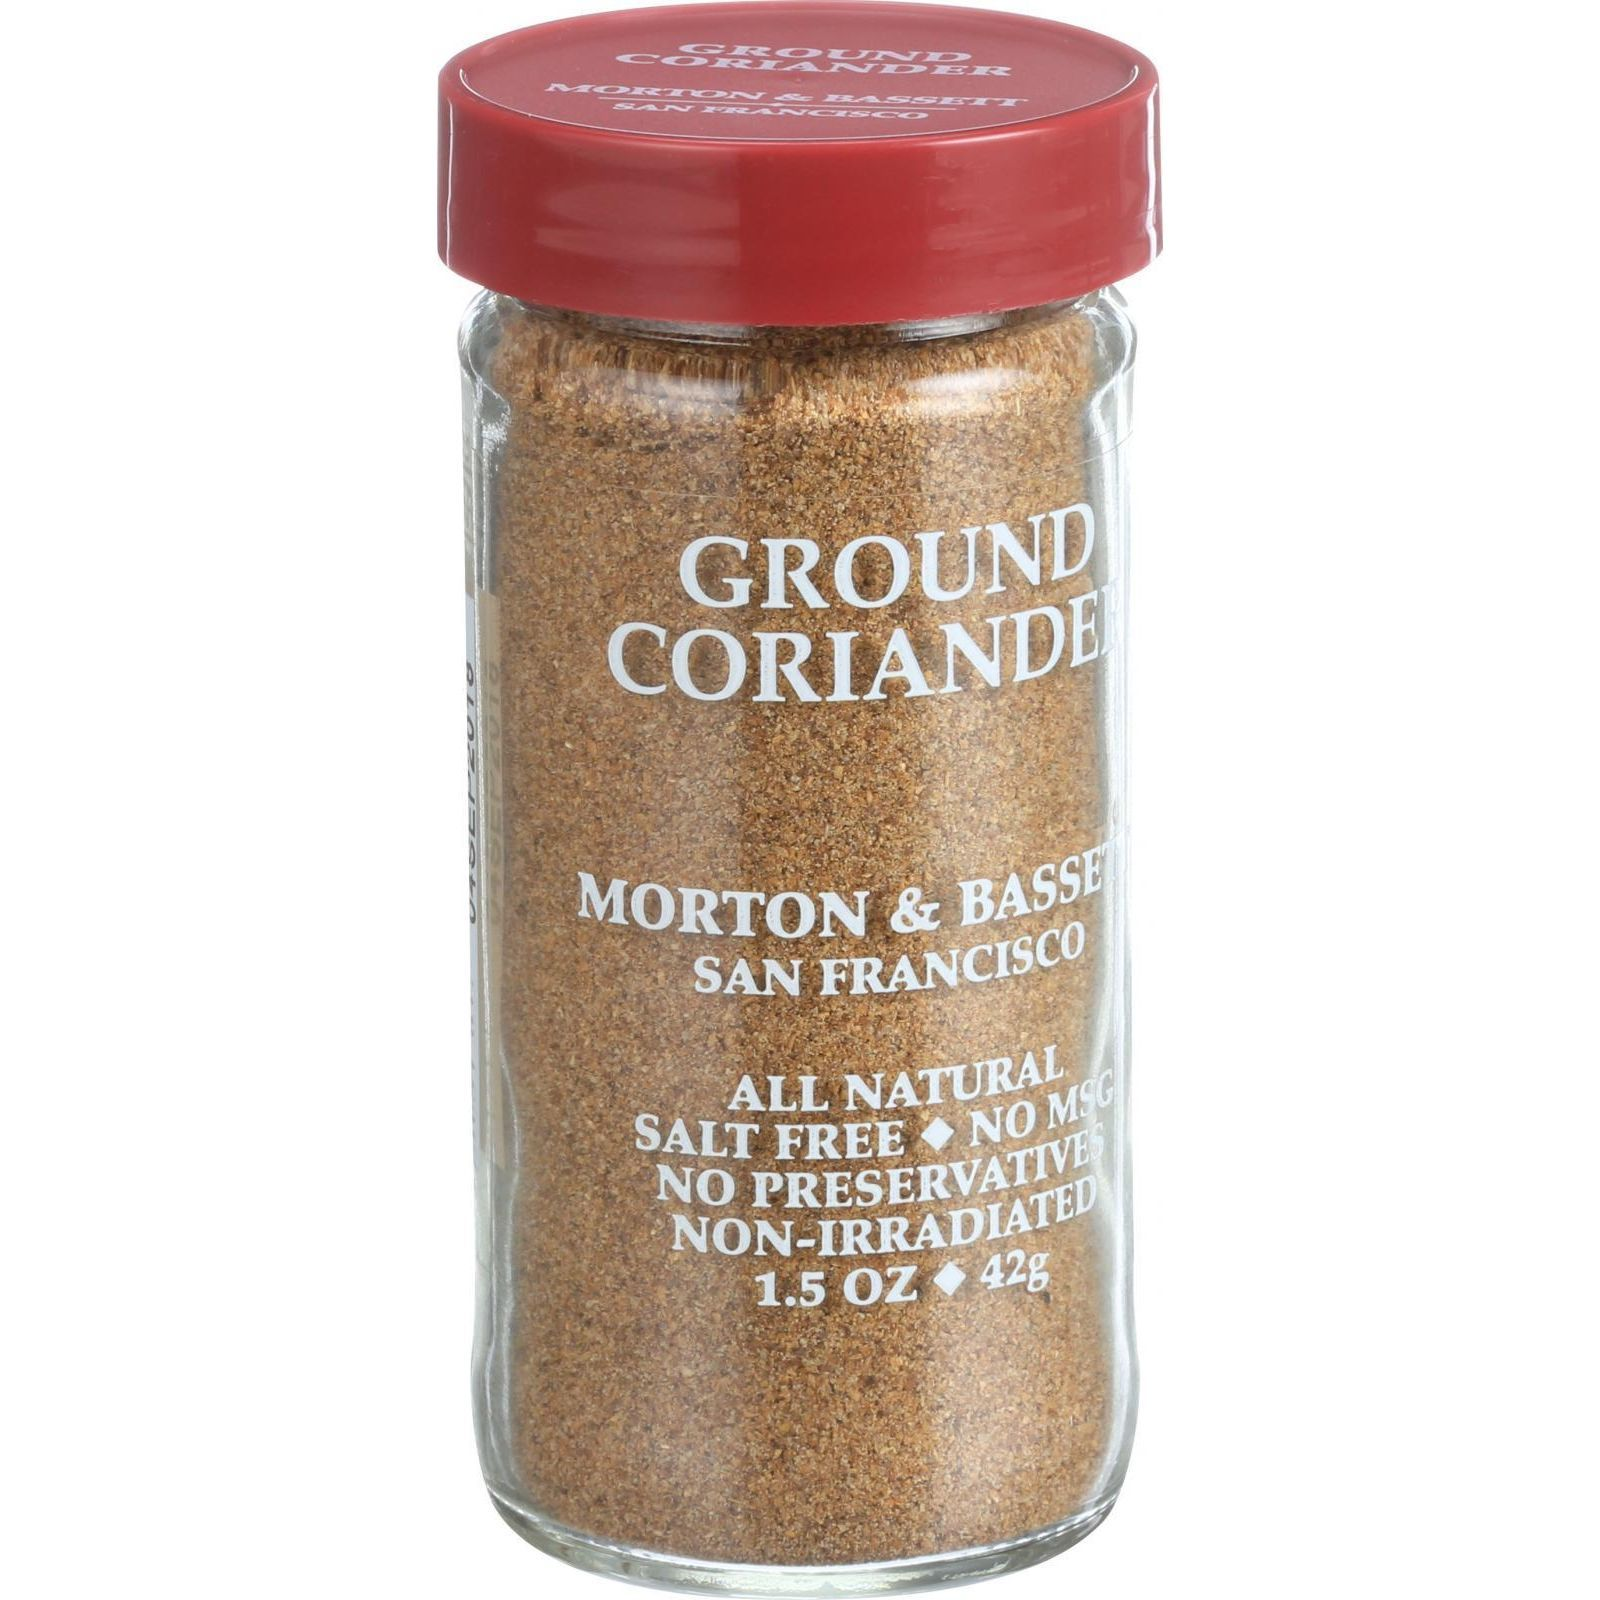 Morton and Bassett Seasoning - Coriander - Ground - 1.5 oz - Case of 3